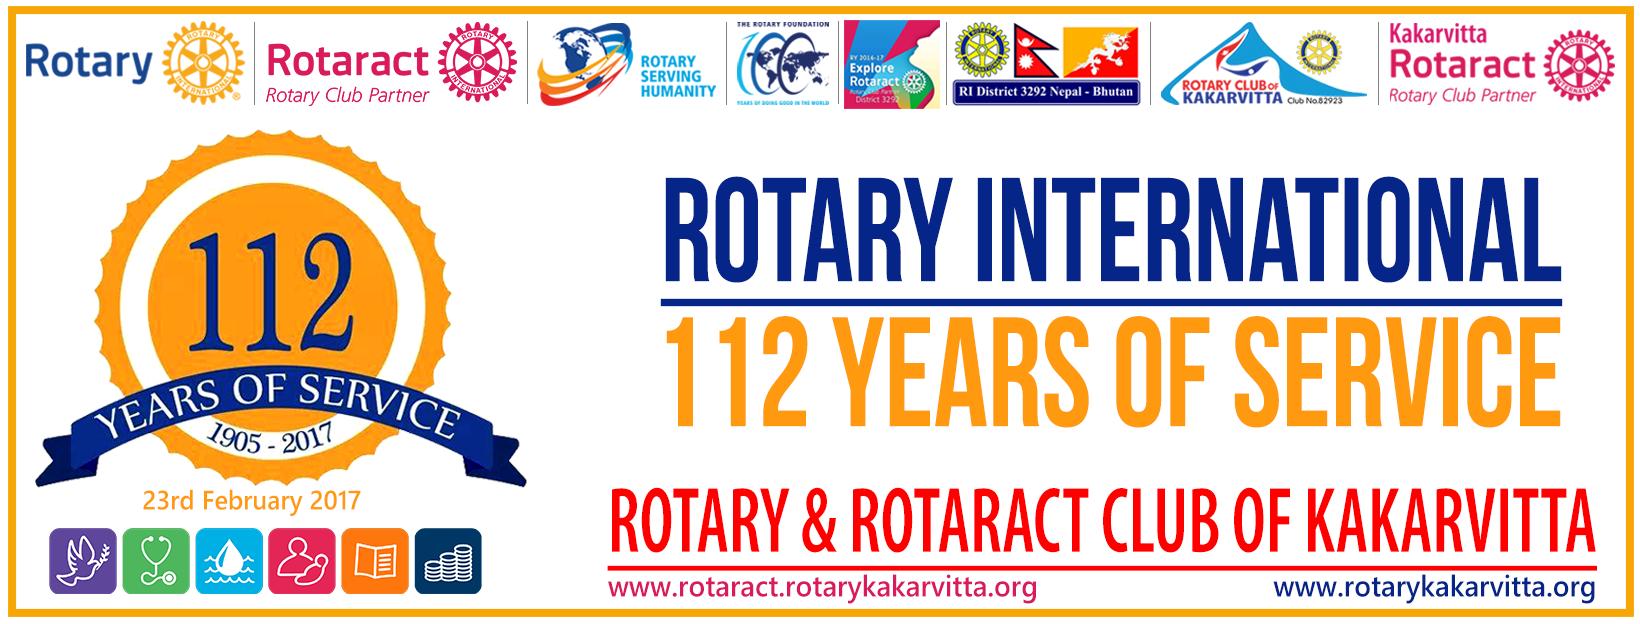 Rotary-international-112-years-of-service